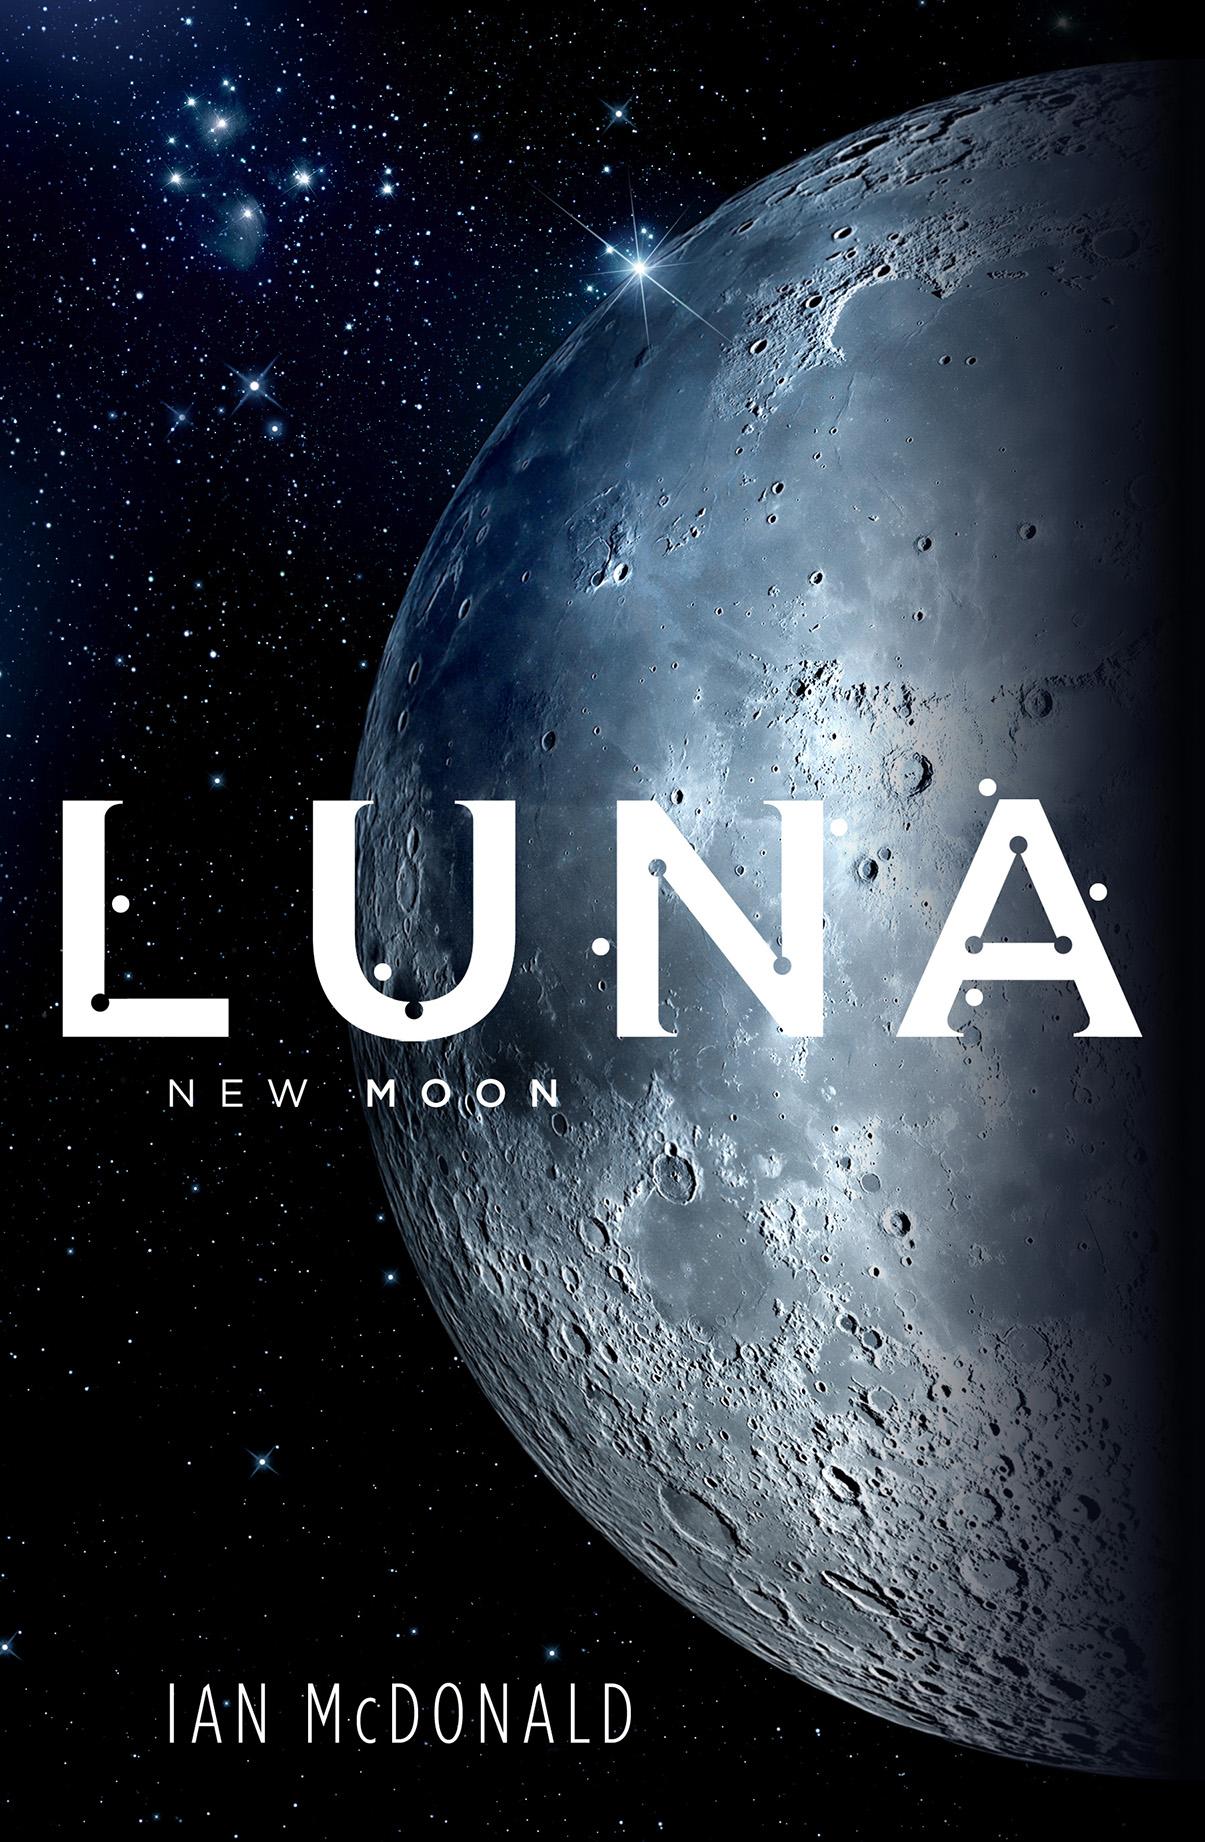 mcdonaldi-luna1-newmoonuk.jpg